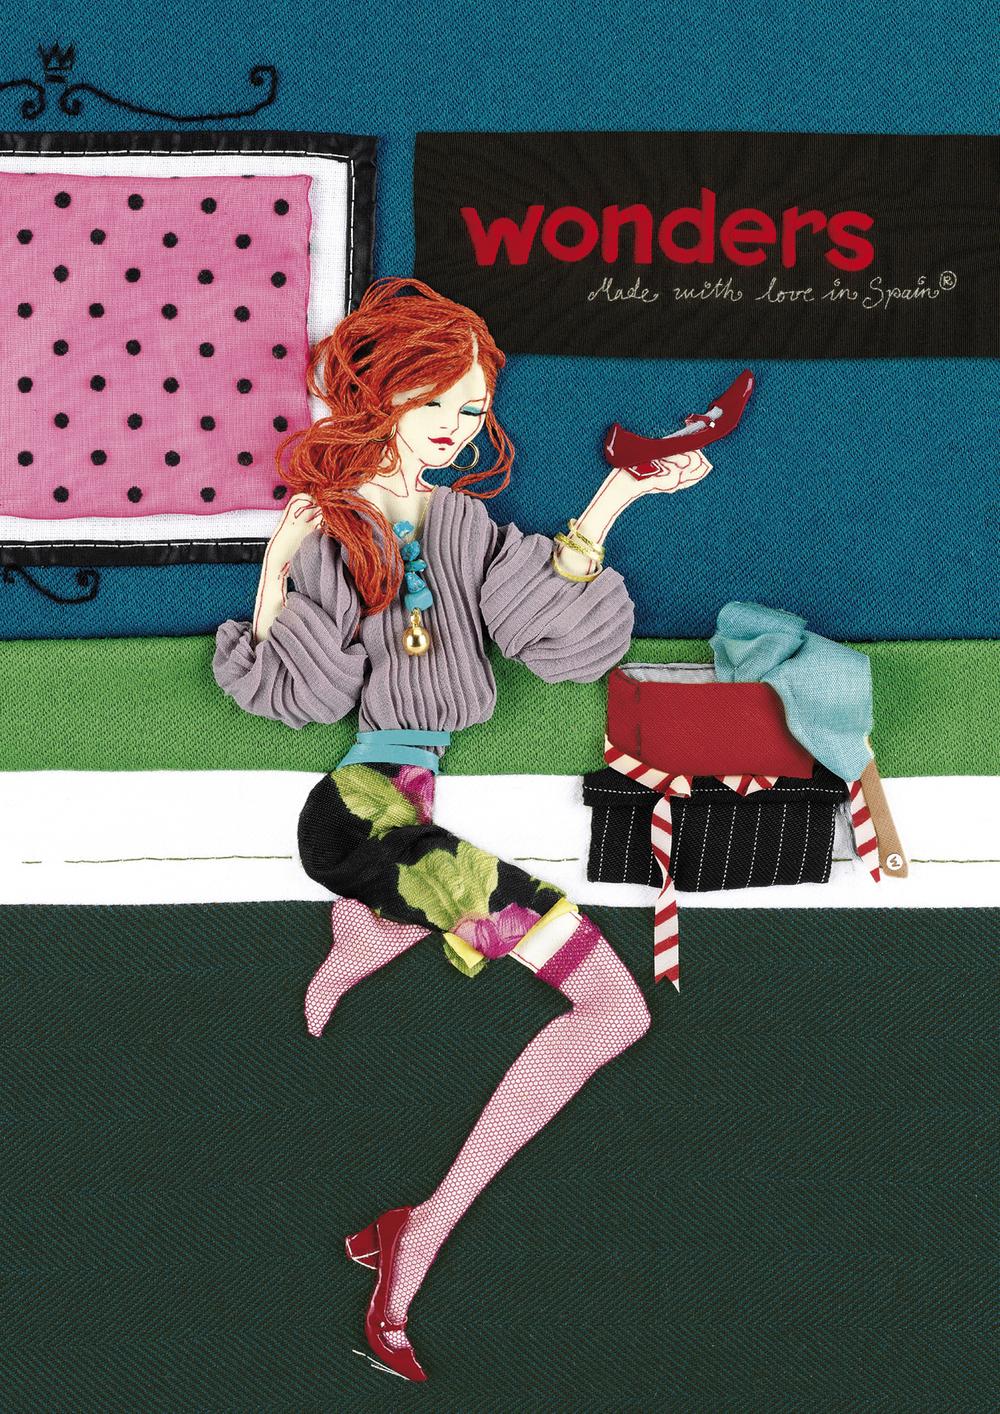 Imaginarte-Wonders-Paula Sanz 01.jpg